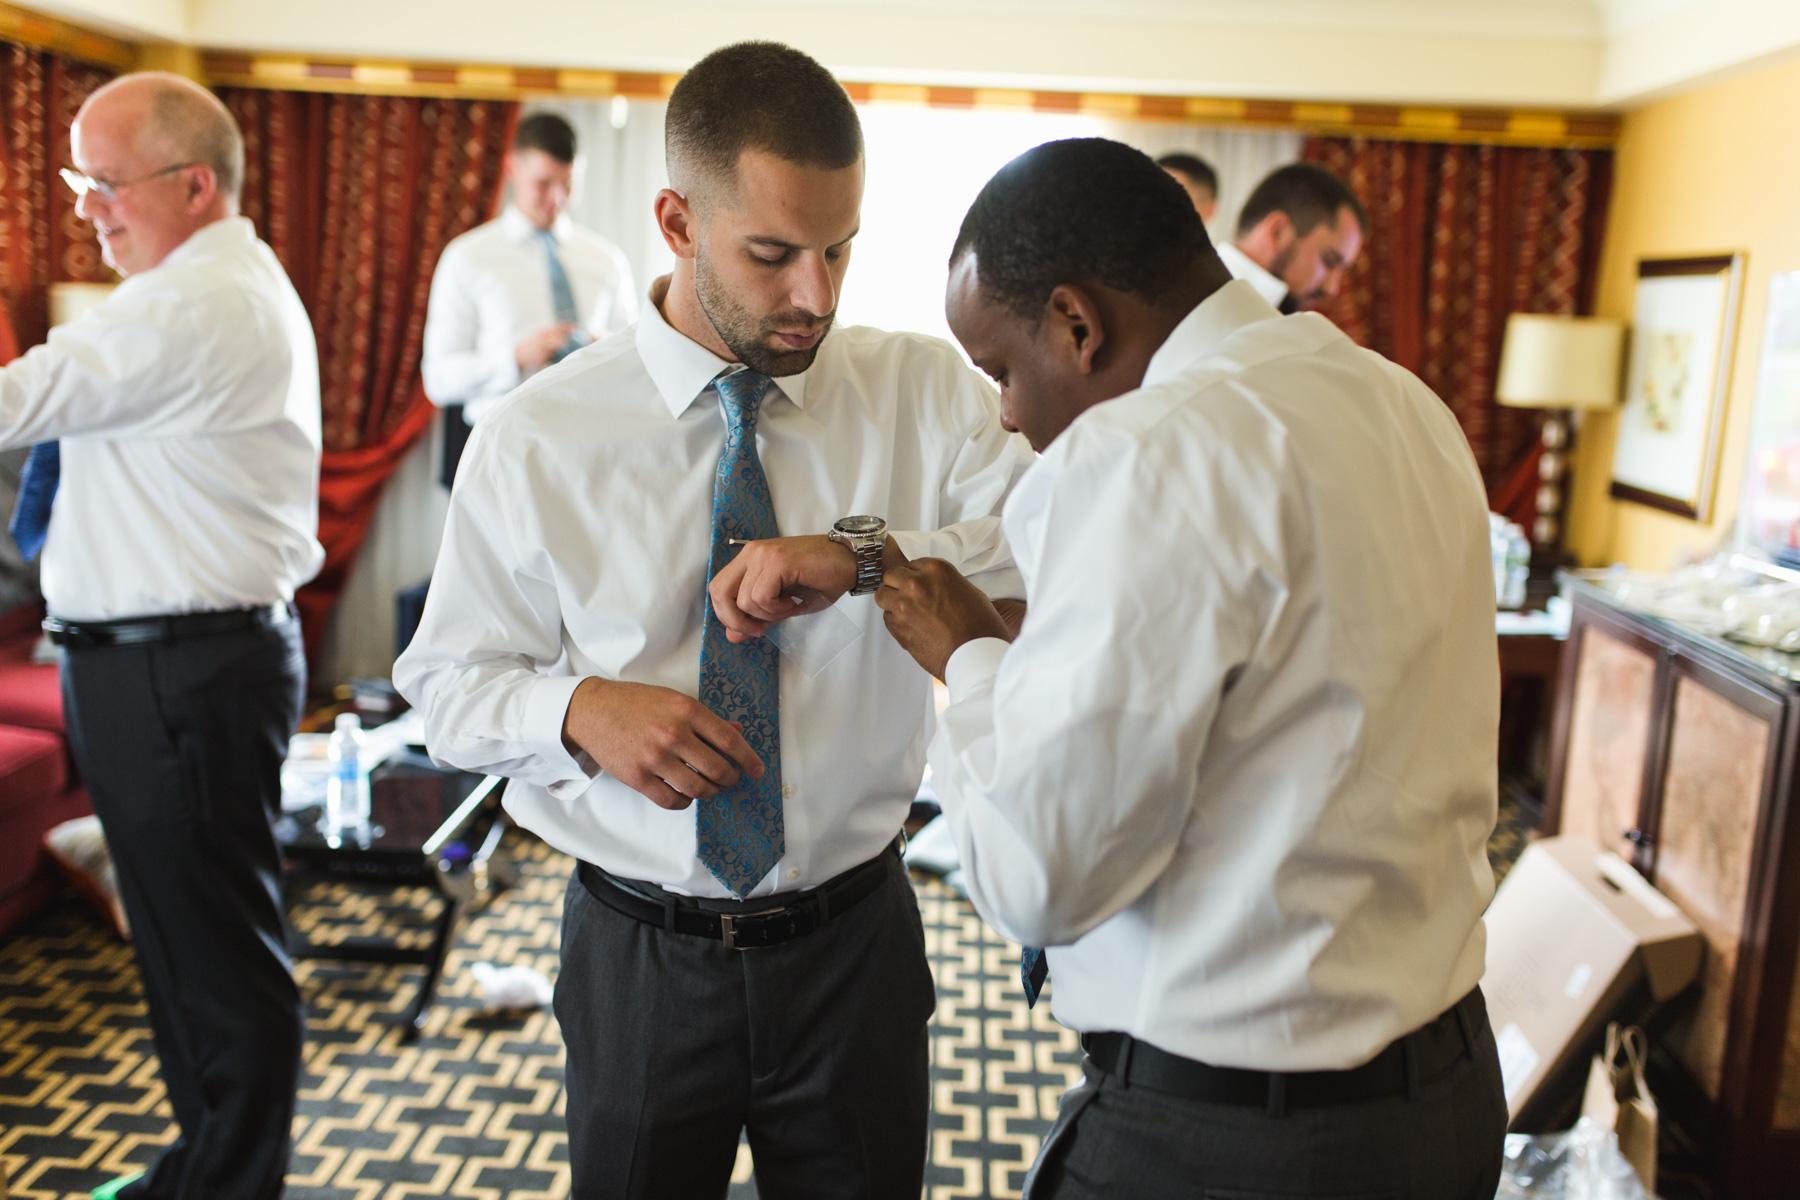 hotel marlowe groomsmen fixing watches and cufflinks